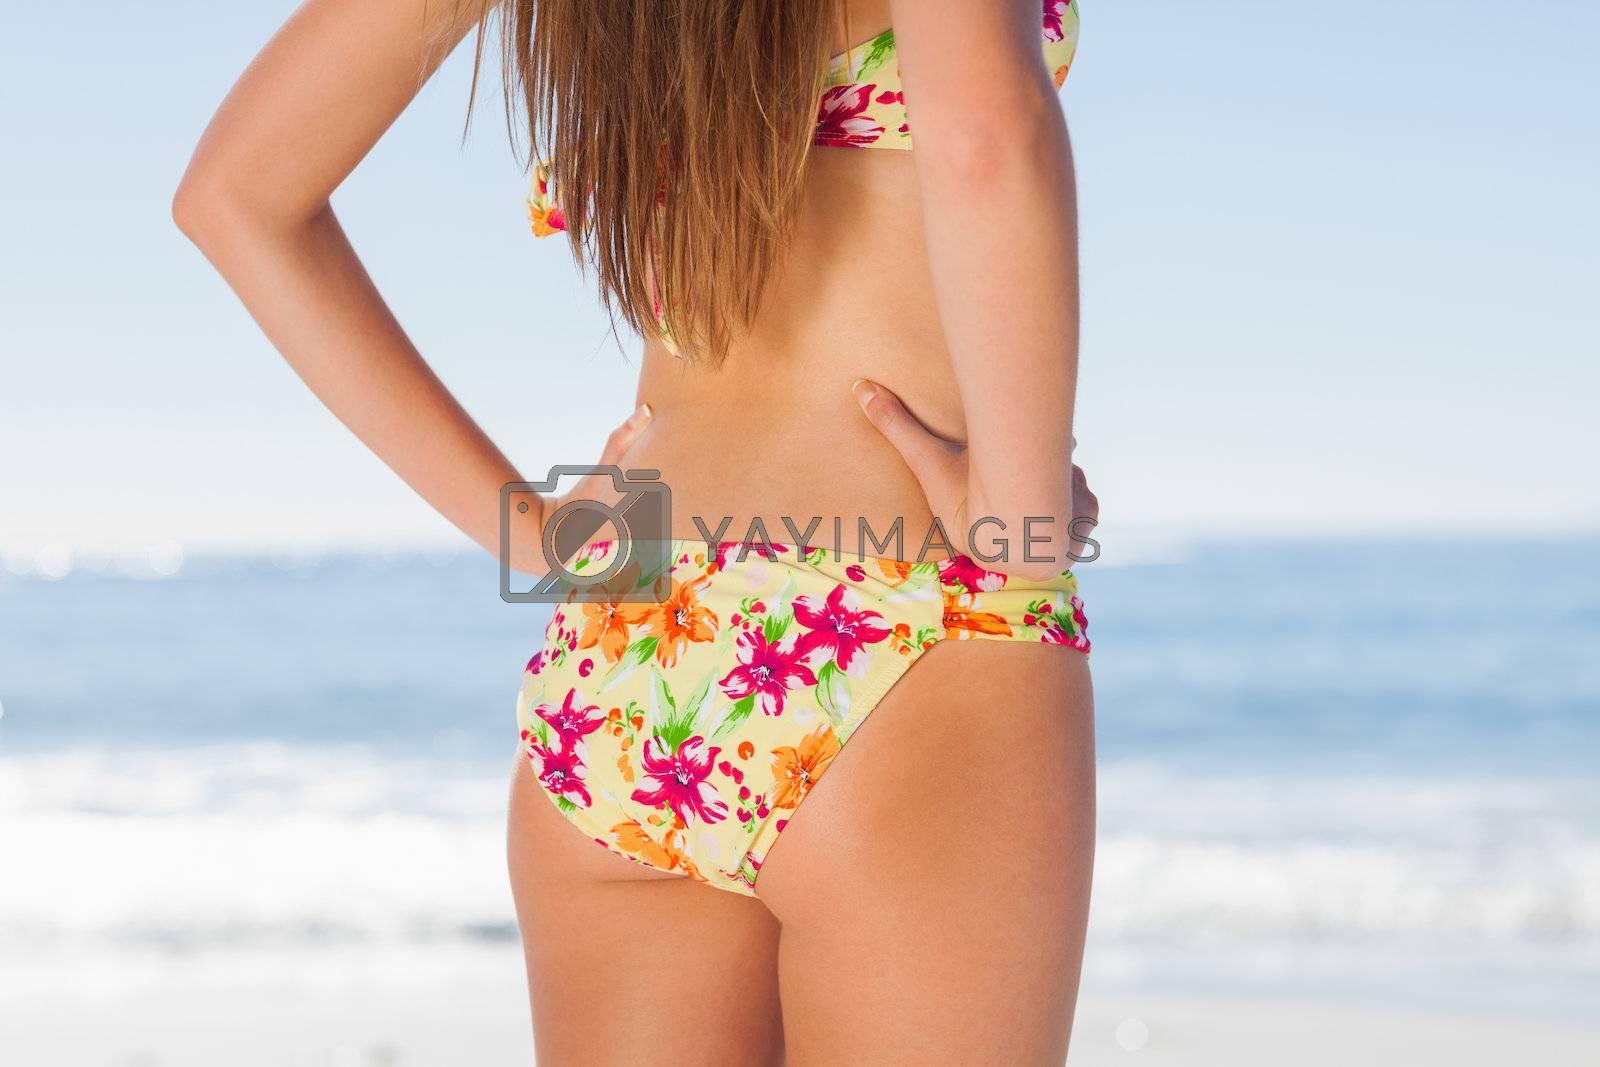 Beautiful woman on the beach in floral bikini by Wavebreakmedia